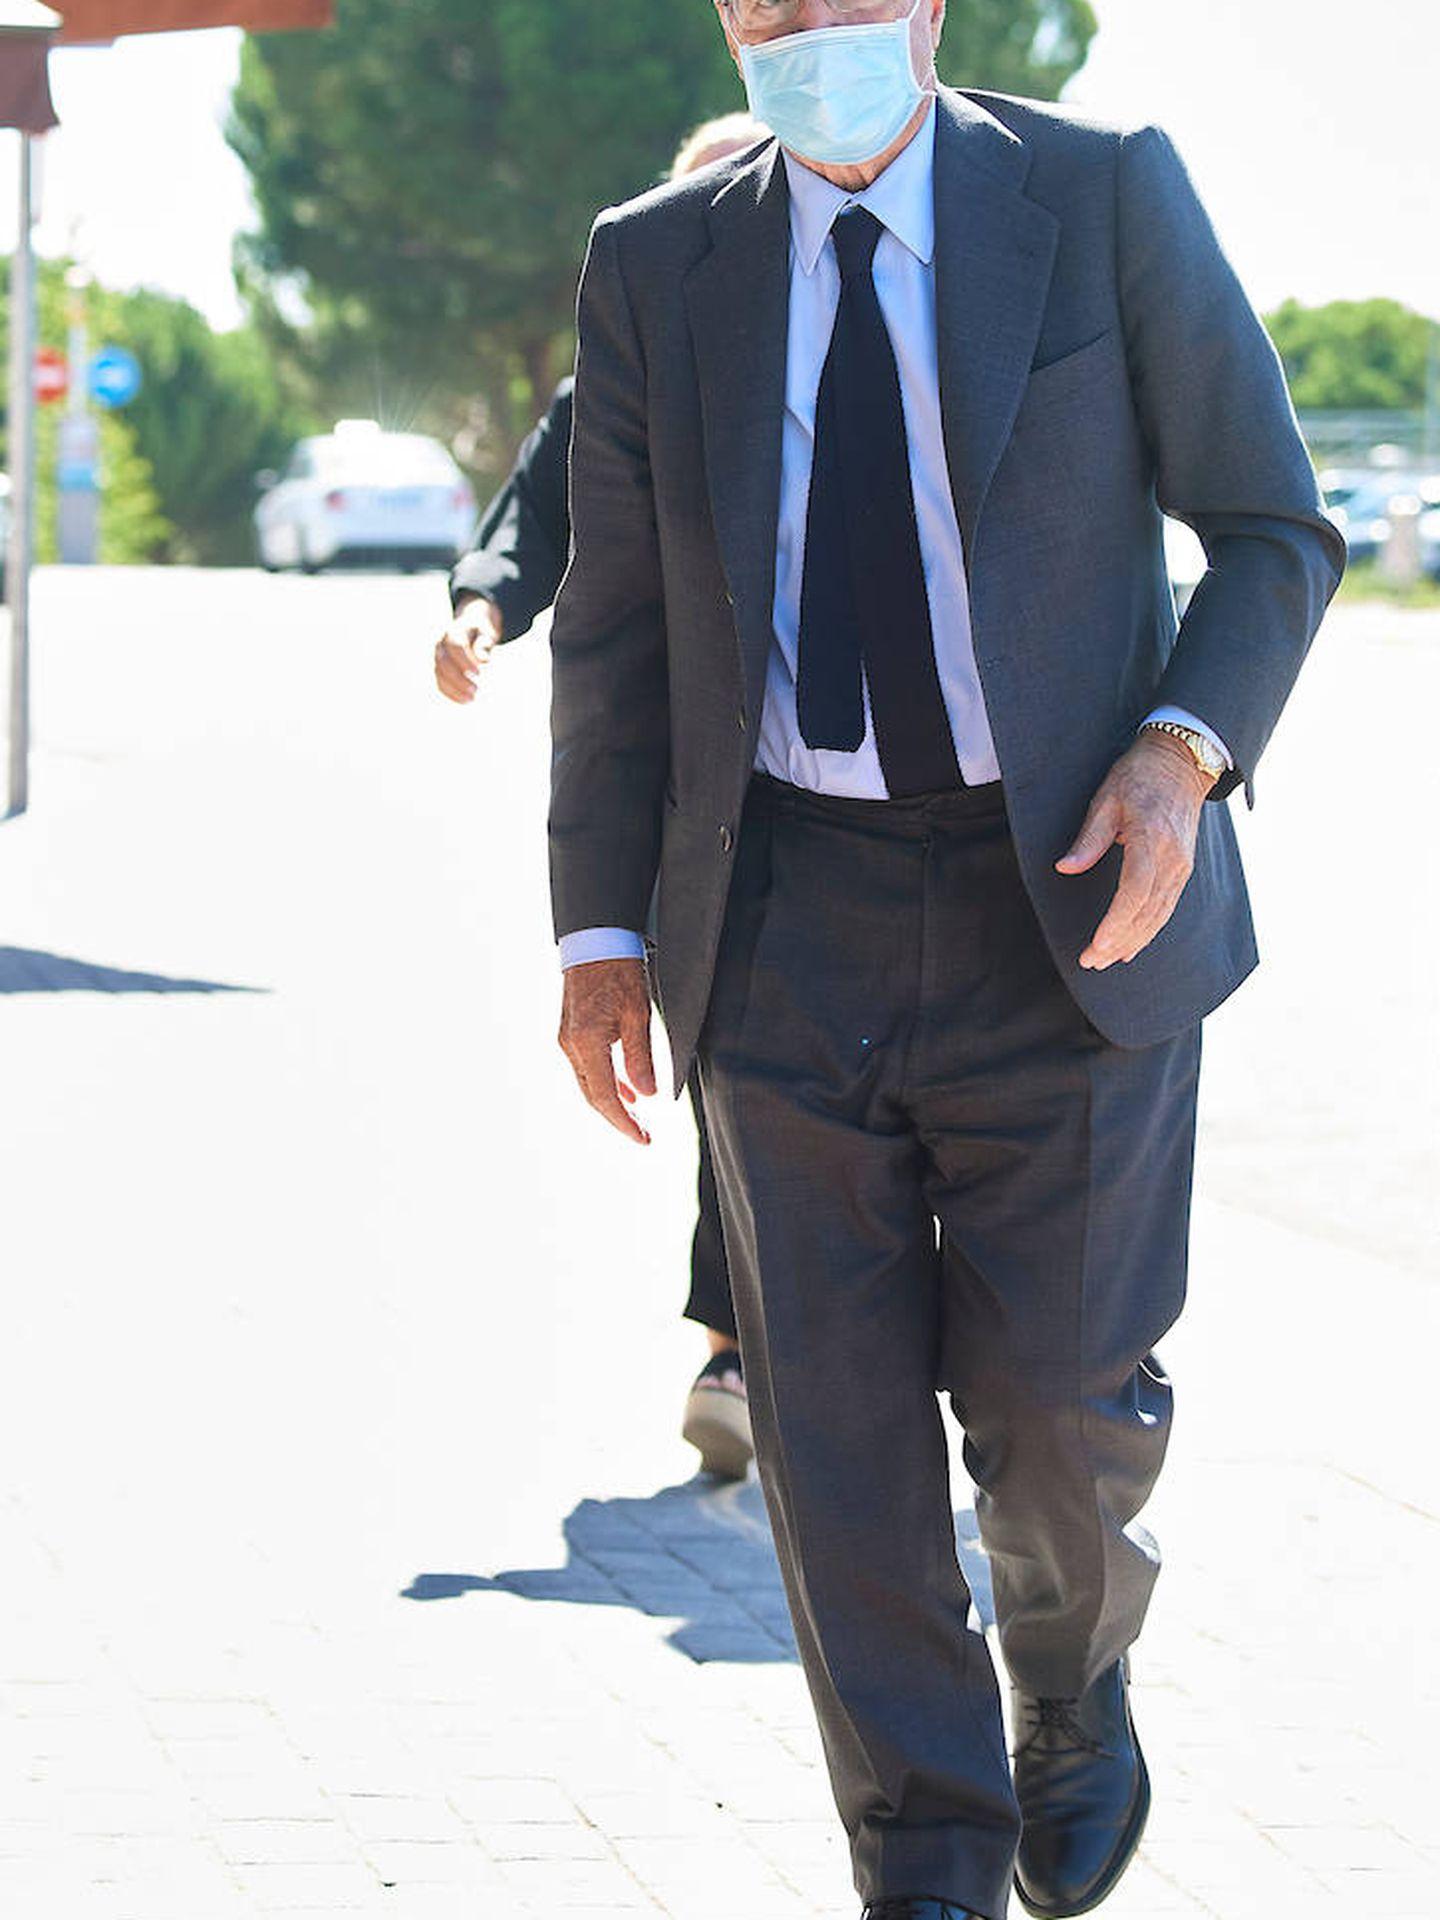 Antonio Garrigues Walker. (Limited Pictures)